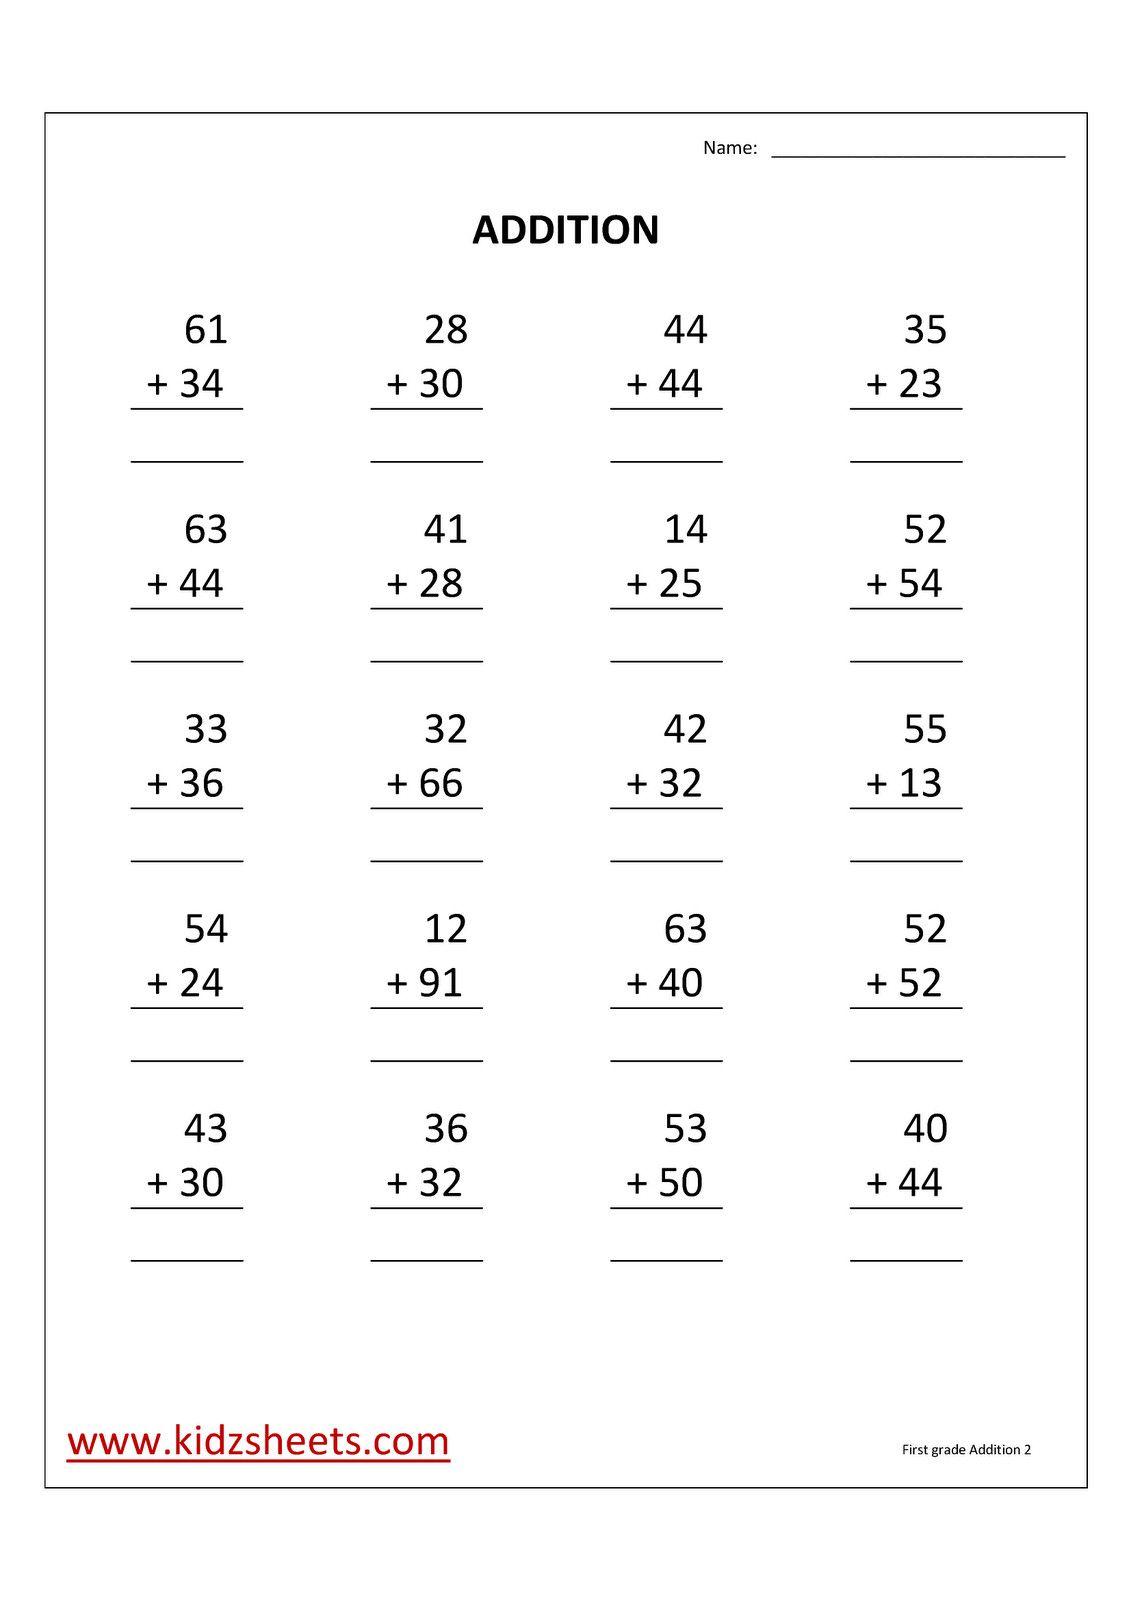 medium resolution of 2 1st Grade Math Worksheets First Grade Math Addition Worksheets in 2020   Math  addition worksheets